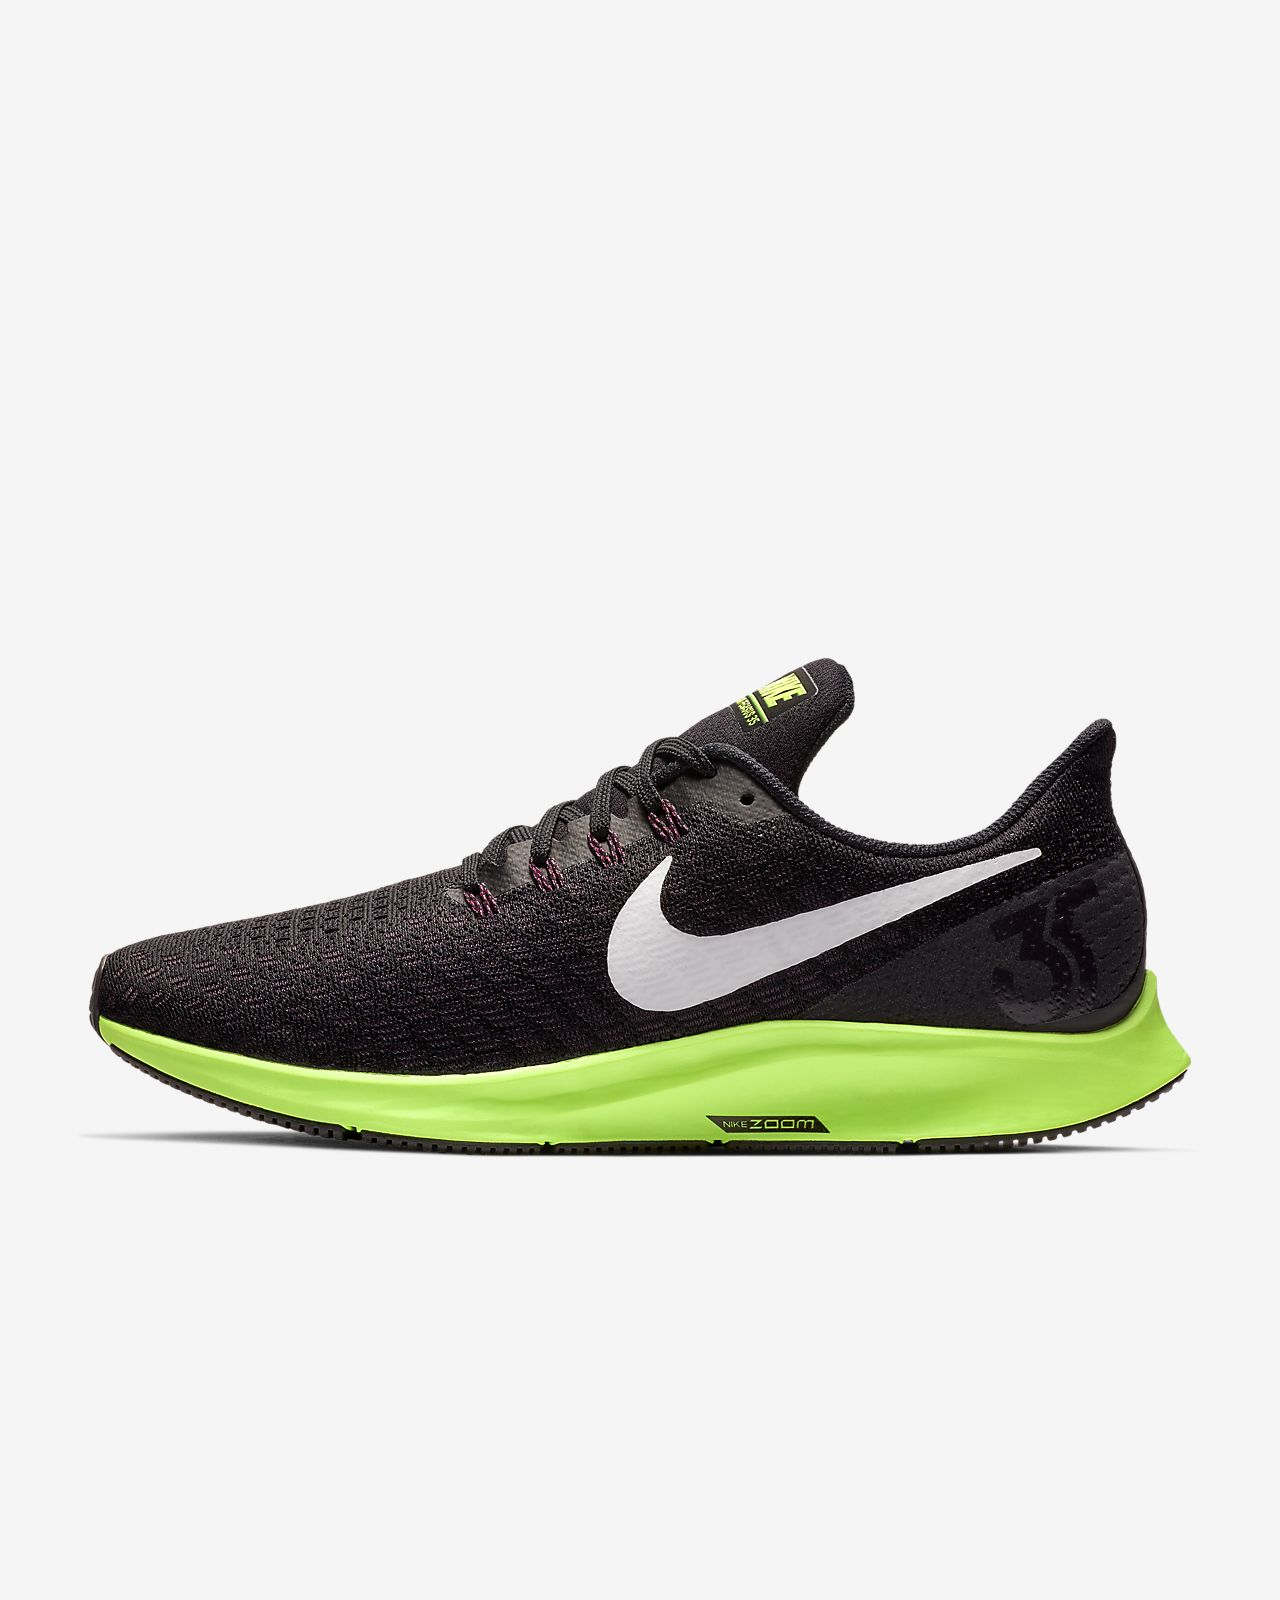 online store 91f4e 6905d ... Calzado de running para hombre Nike Air Zoom Pegasus 35